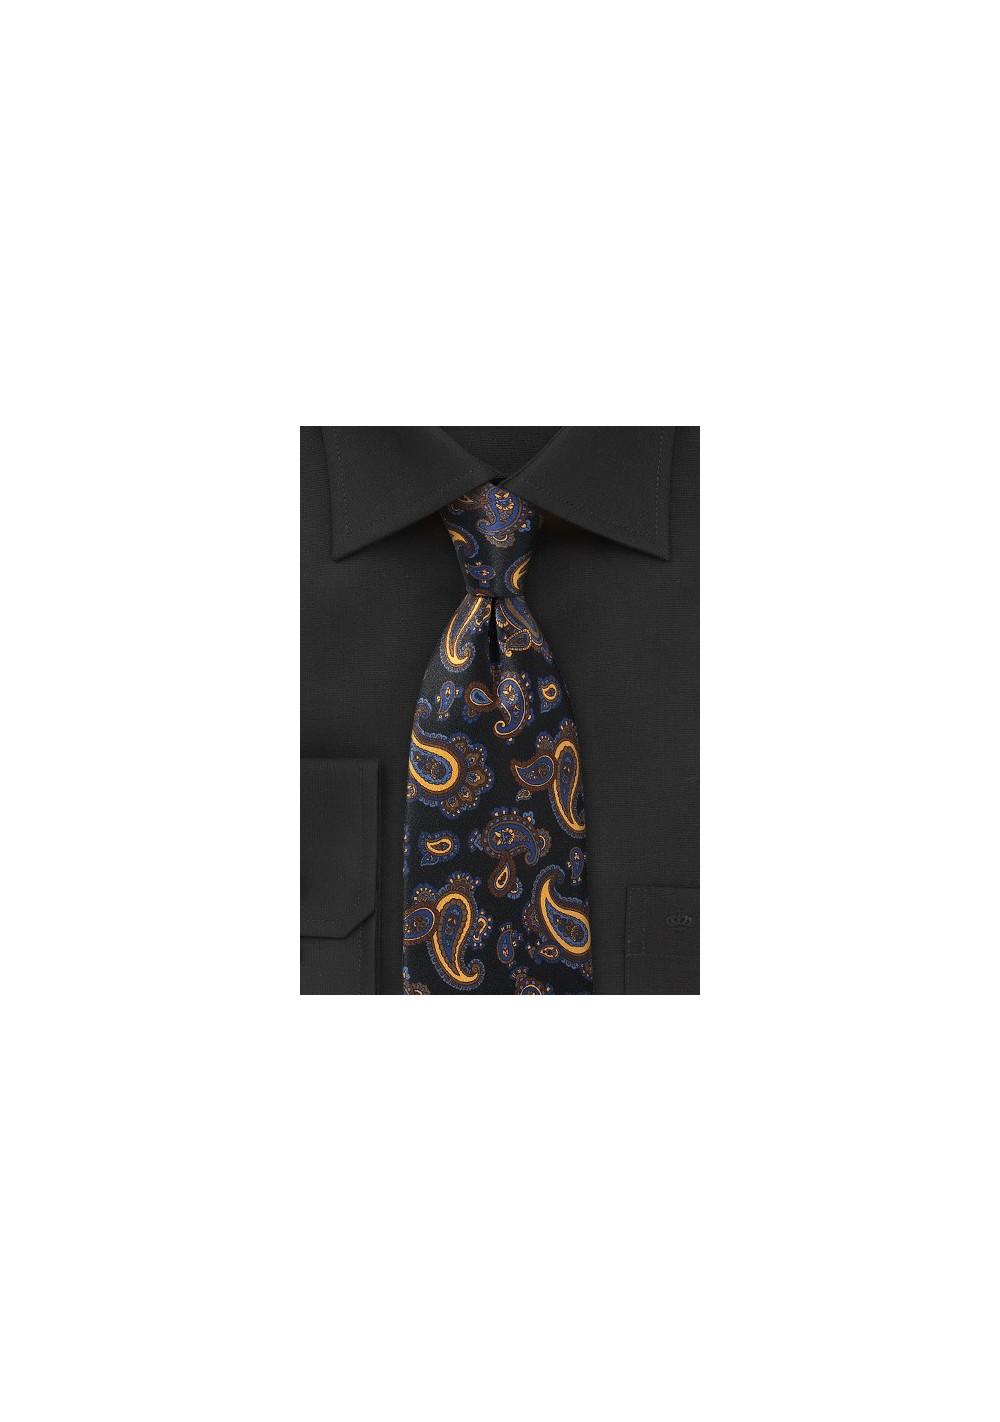 Elegant Paisley Tie in Blacks, Blues and Golds